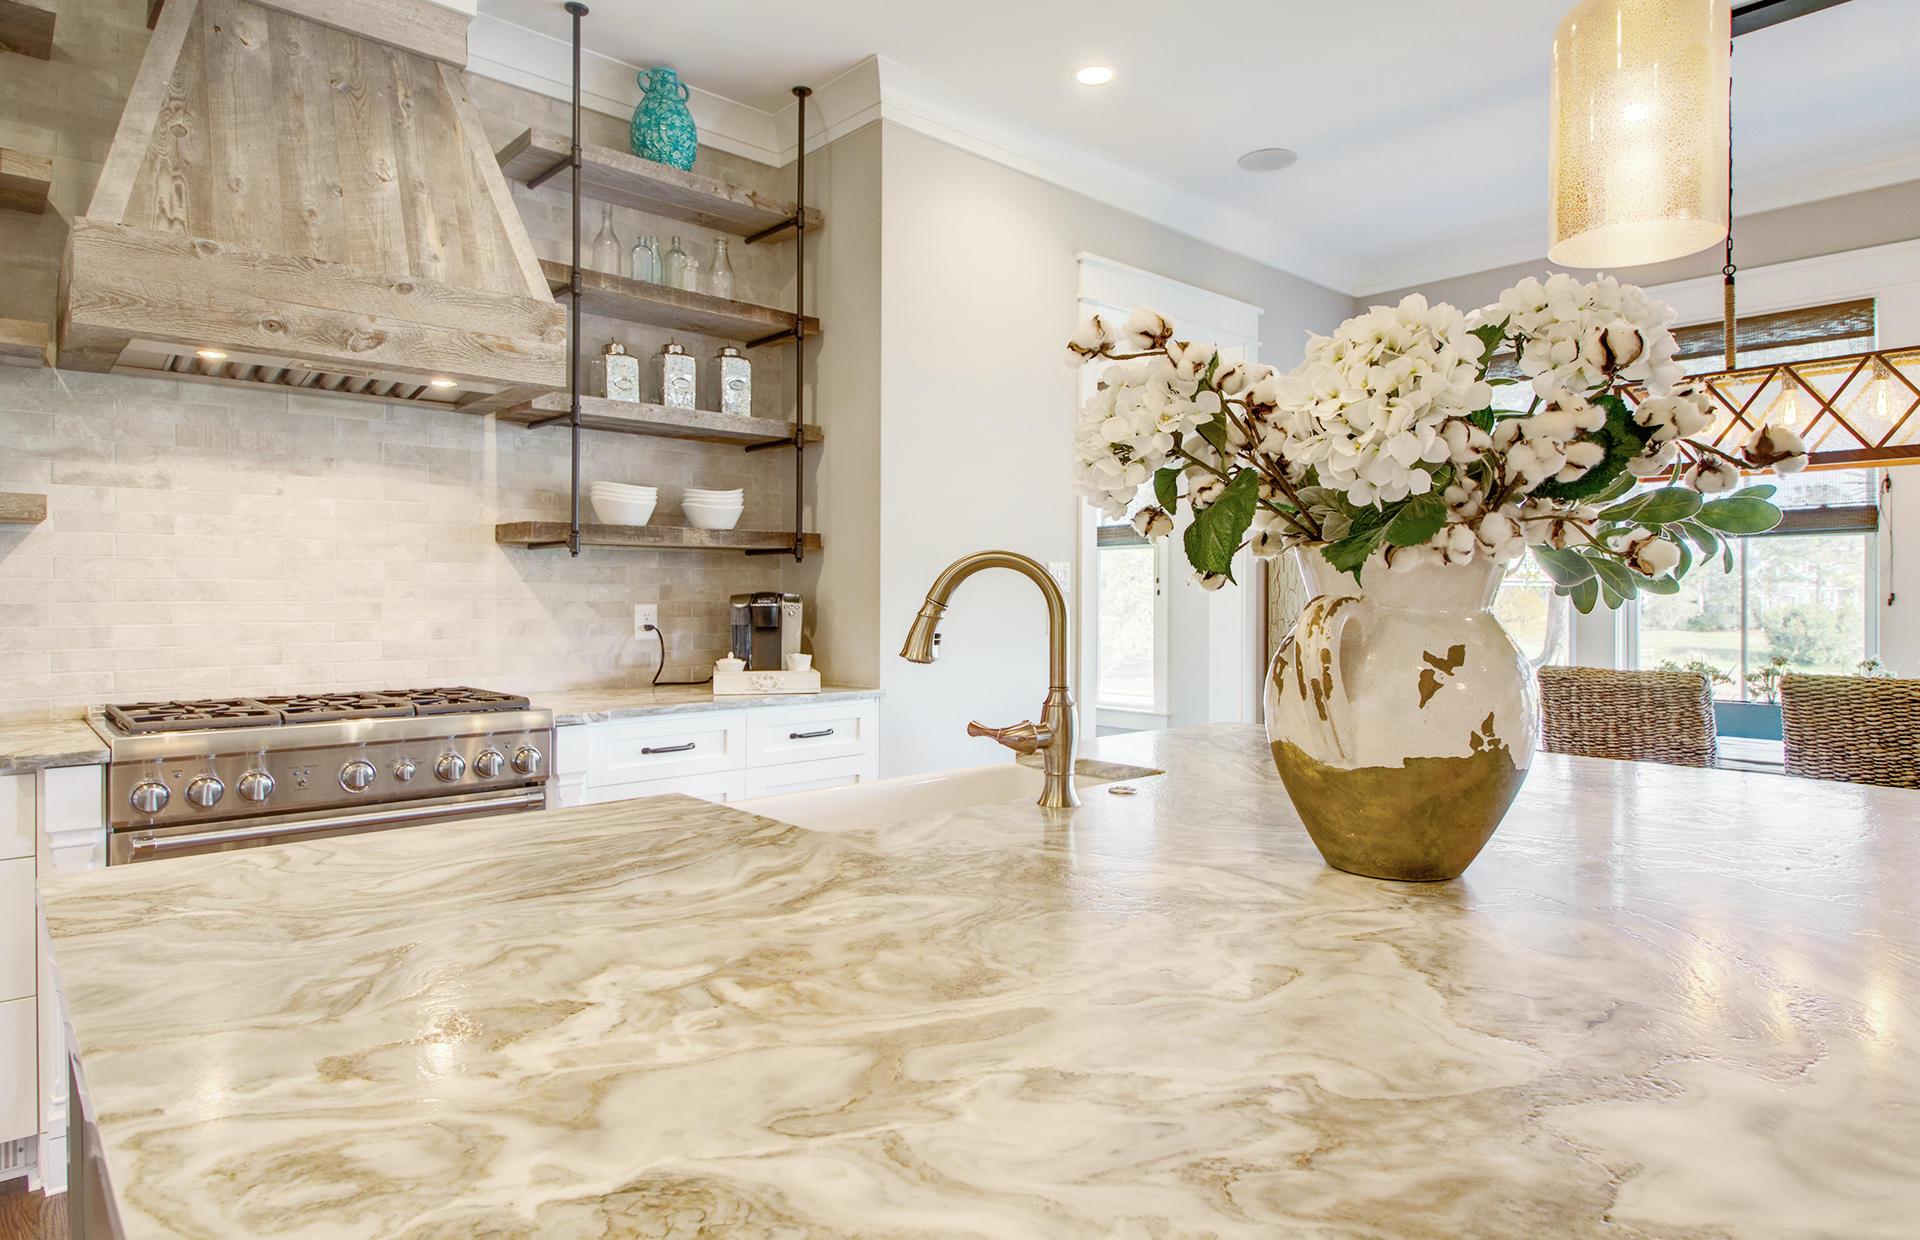 Daniel Island Park Homes For Sale - 117 Brailsford, Charleston, SC - 29